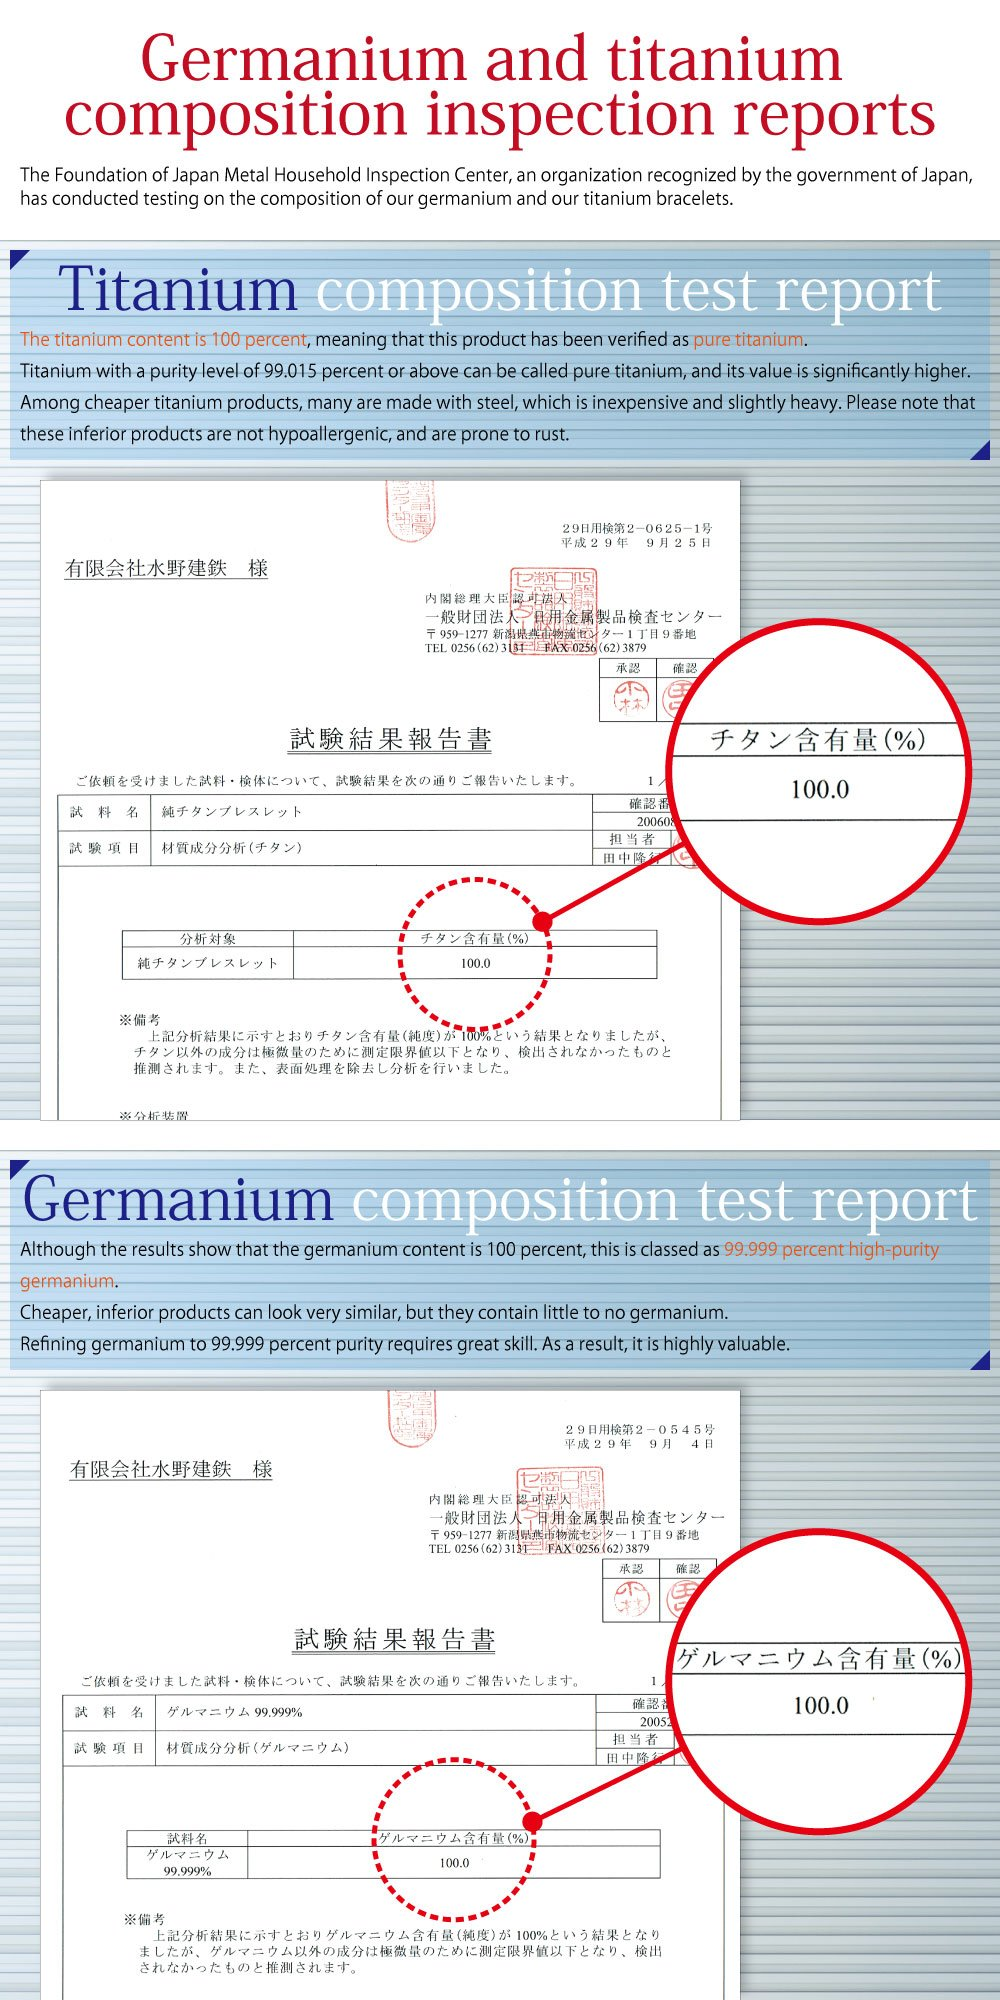 Over-9 Germanium Bracelet for Men Elegant Therapy Titanium Magnetic Sport Pain Relief for Arthritis and Carpal Tunnel (Germanium 99.999%)